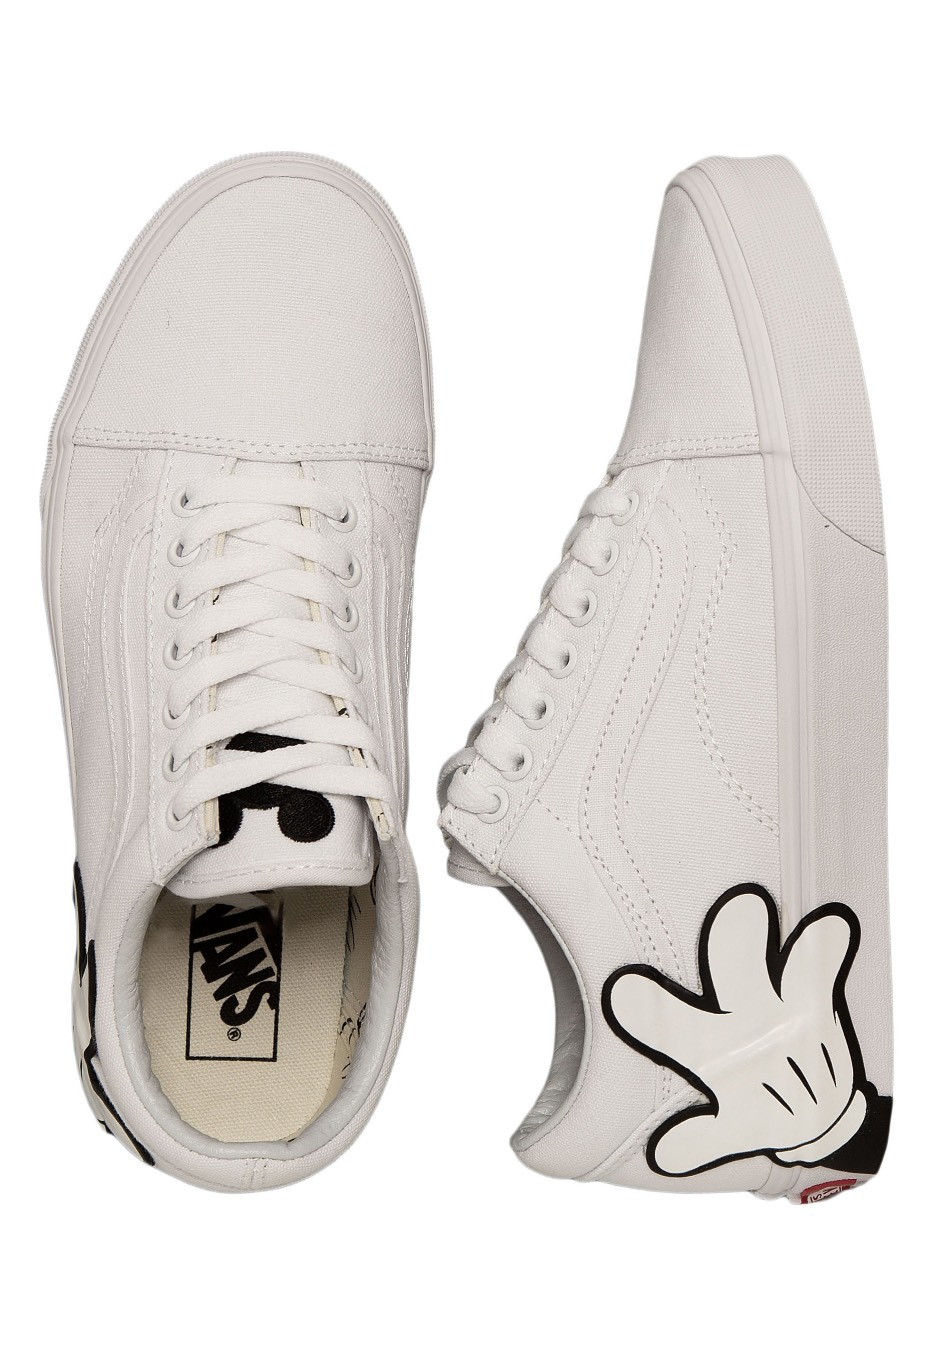 vans femme chaussure disney